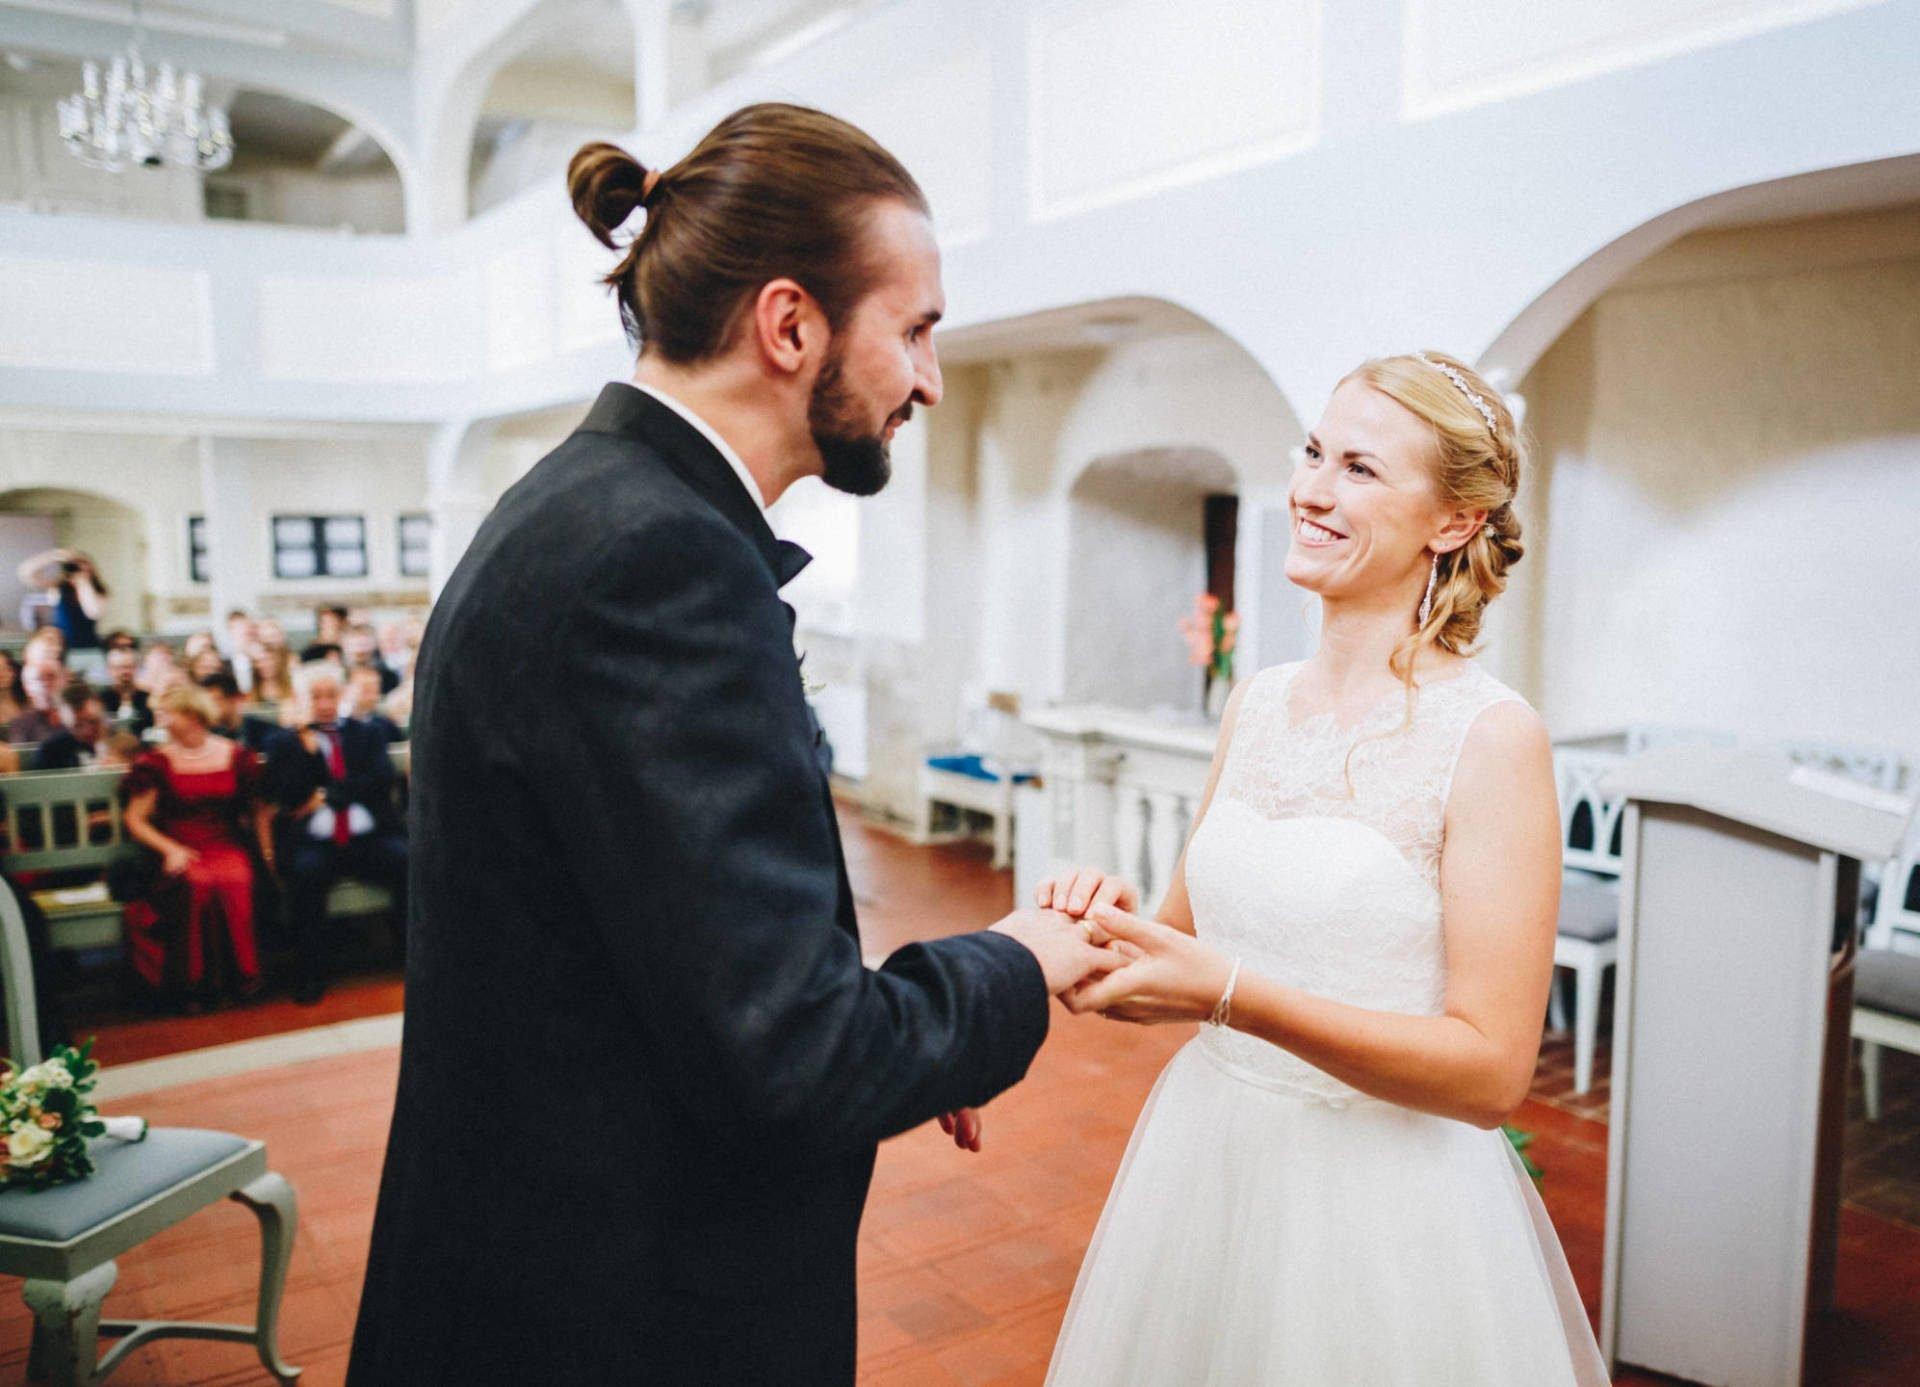 JuleSascha 10 1920x1387 - Hochzeit im alten Dornburger Schloss